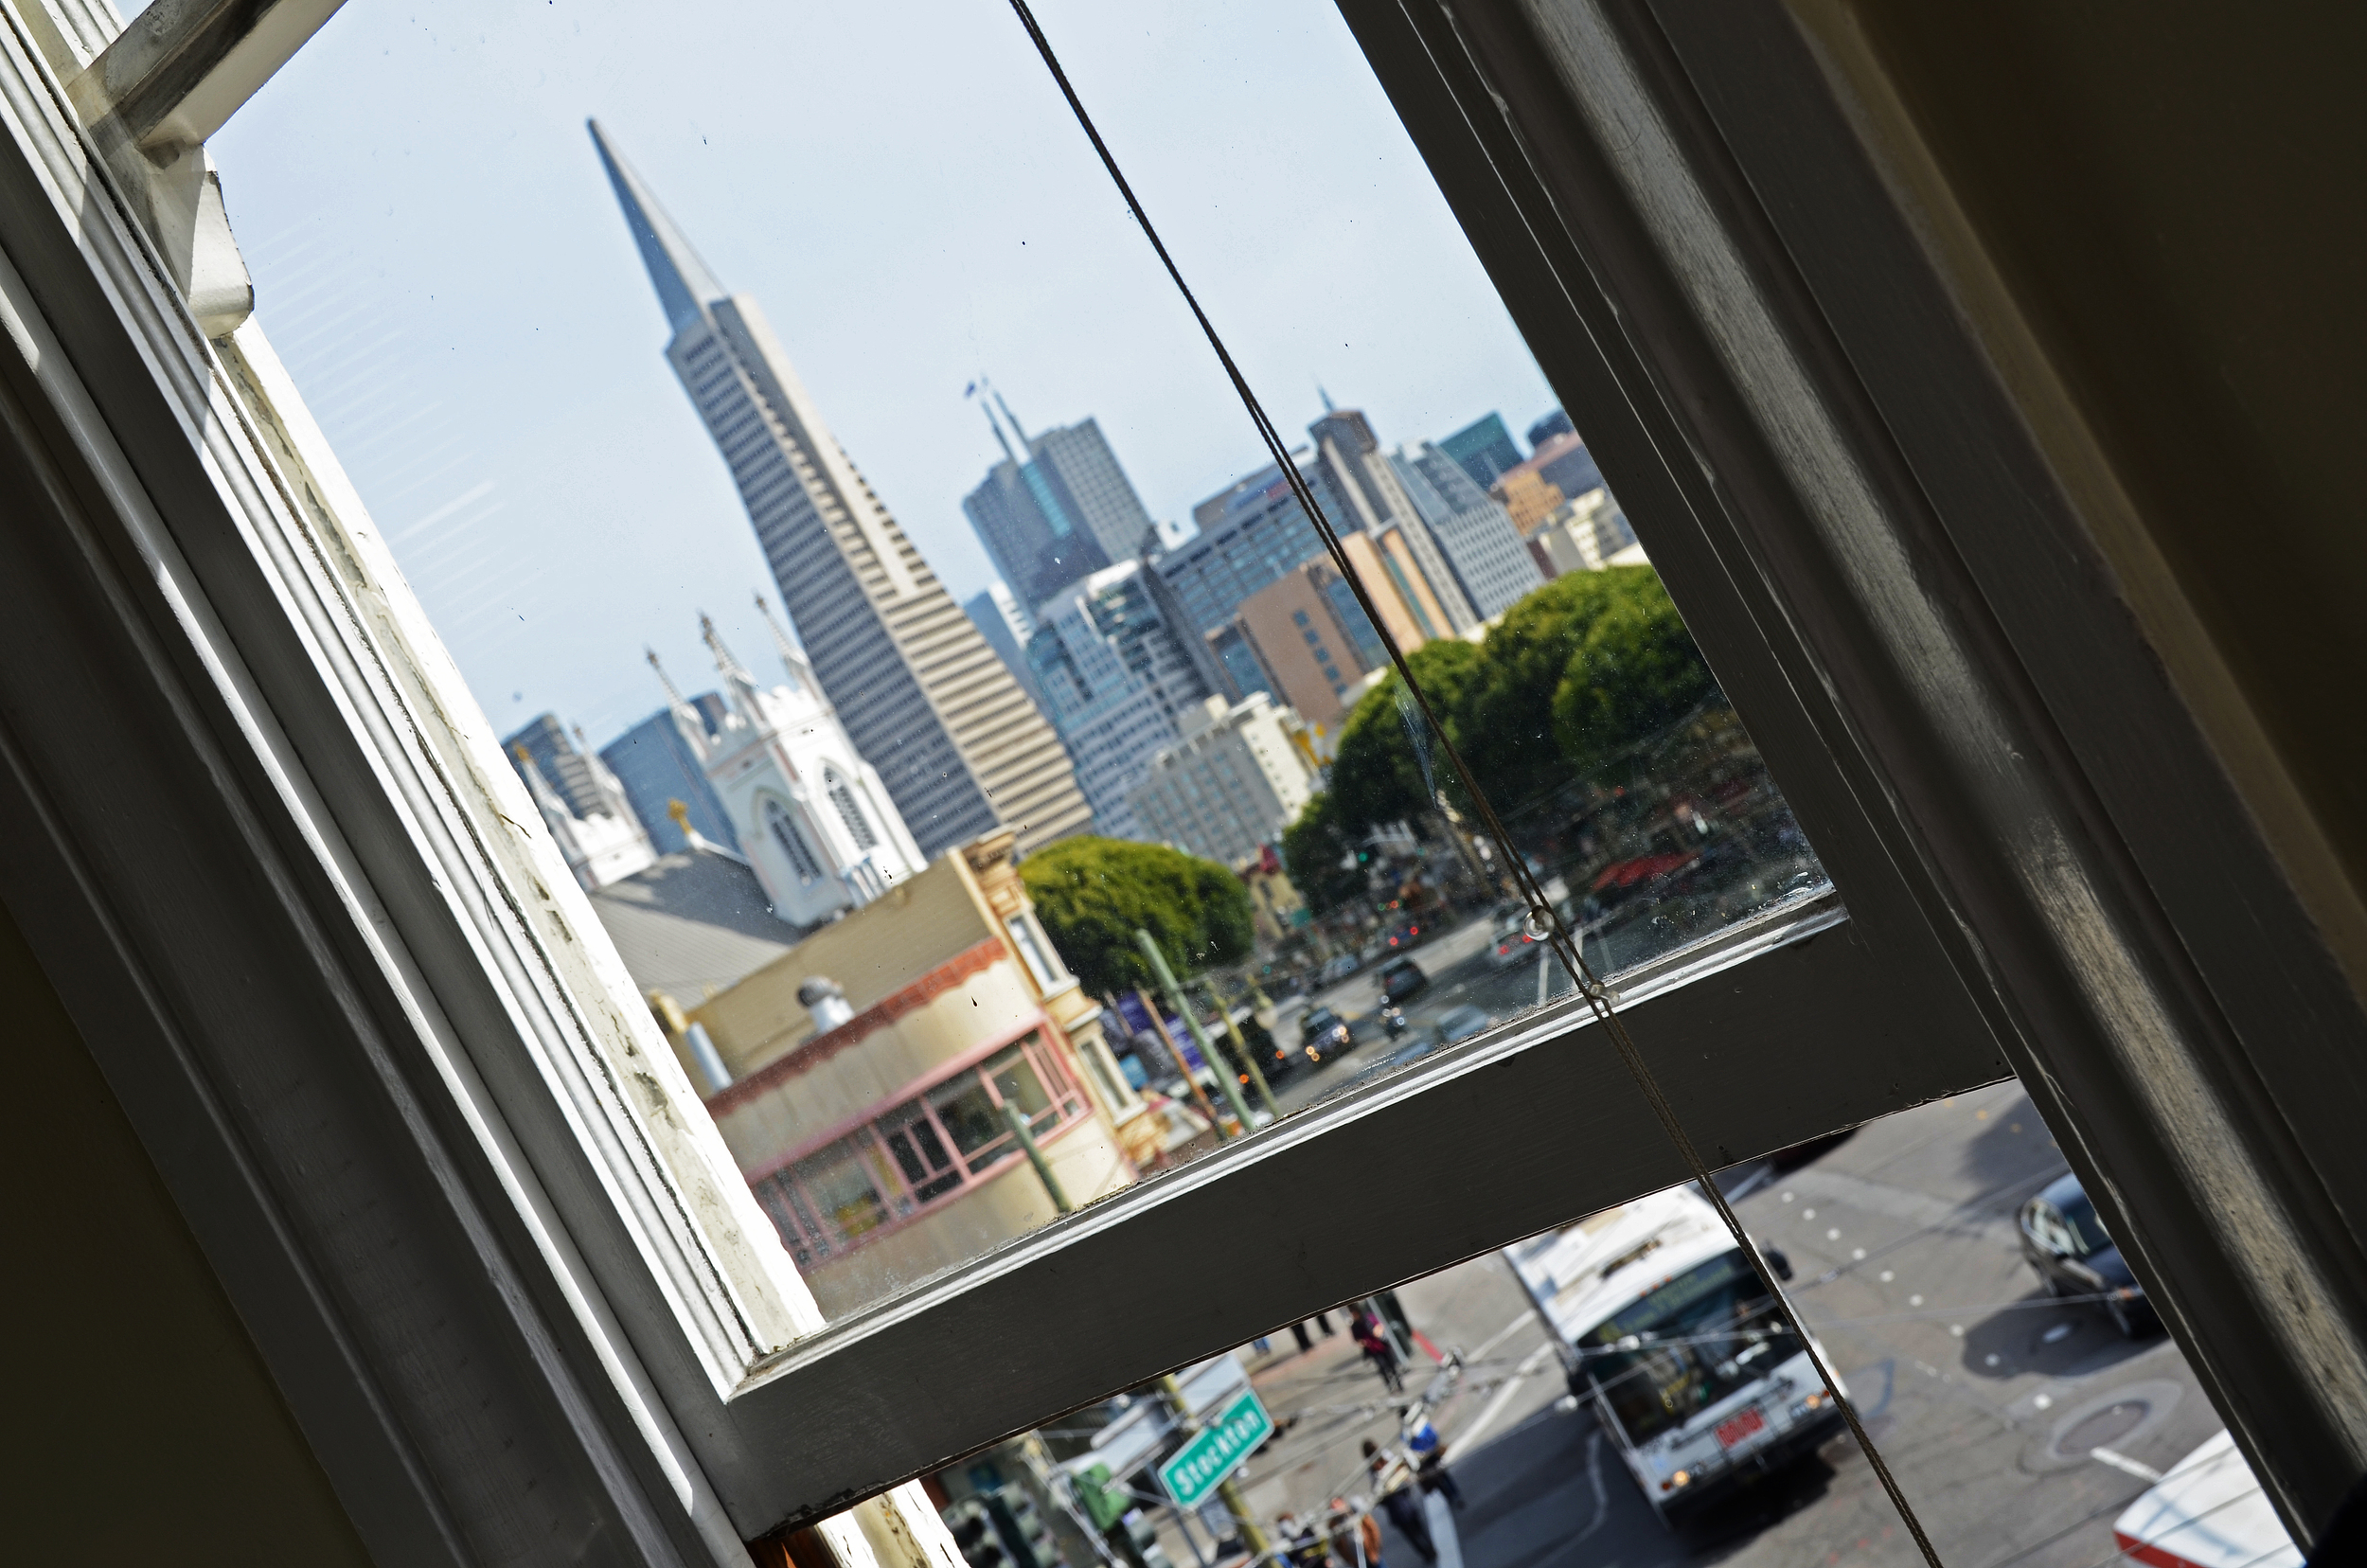 window_tilt.jpg